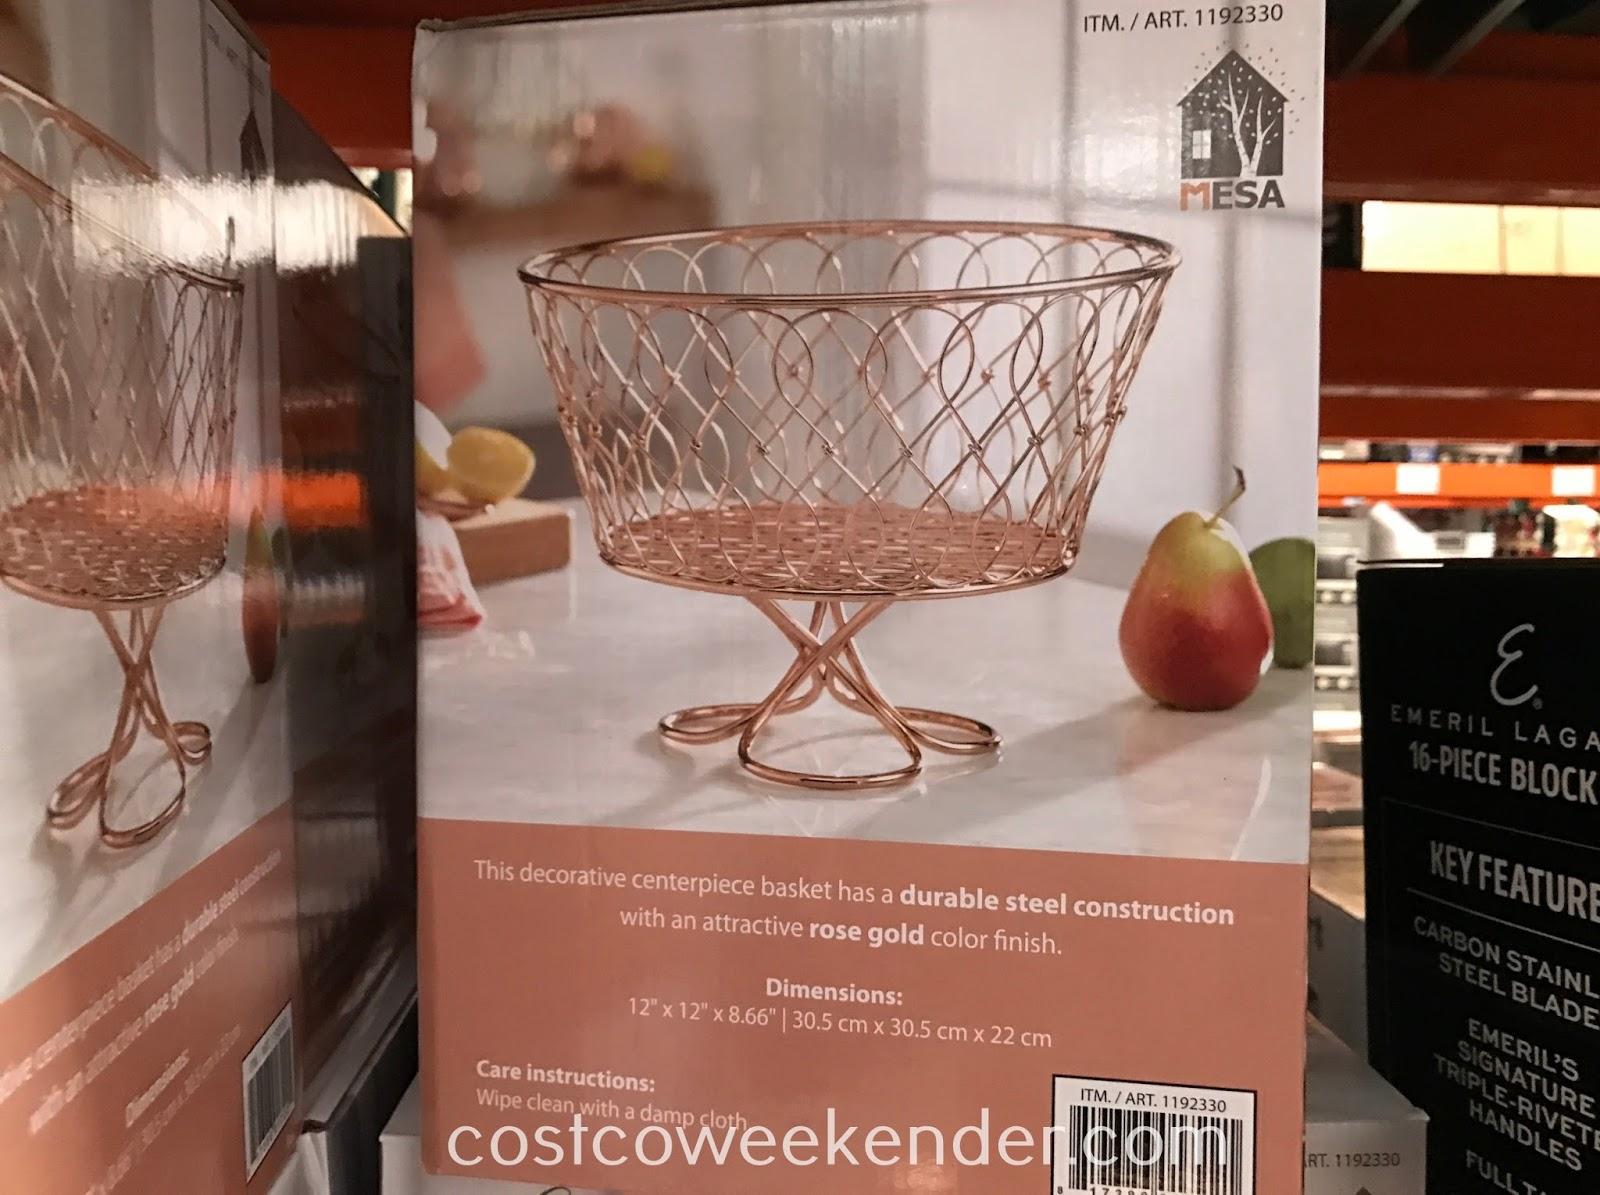 Costco 1192330 - Vanderbilt Loop Twist Pedestal Basket: a great addition to any kitchen counter